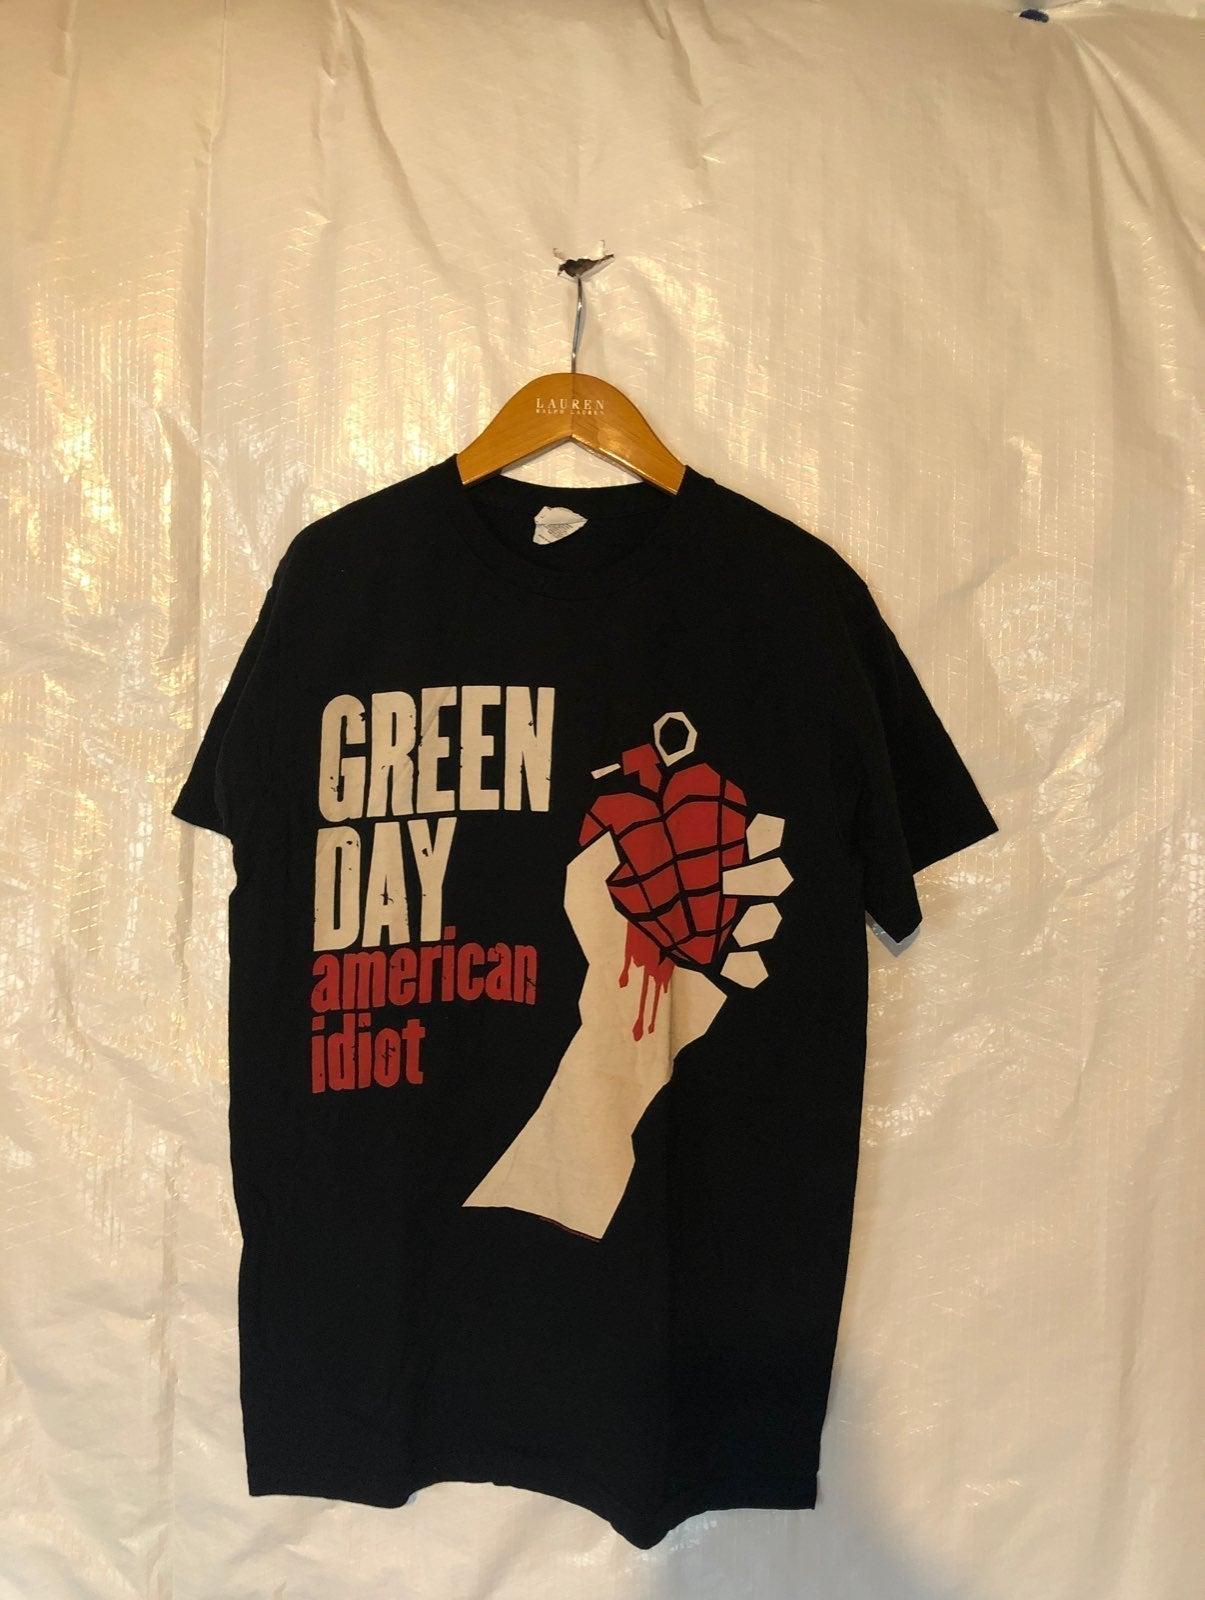 Green day, 2000's tee